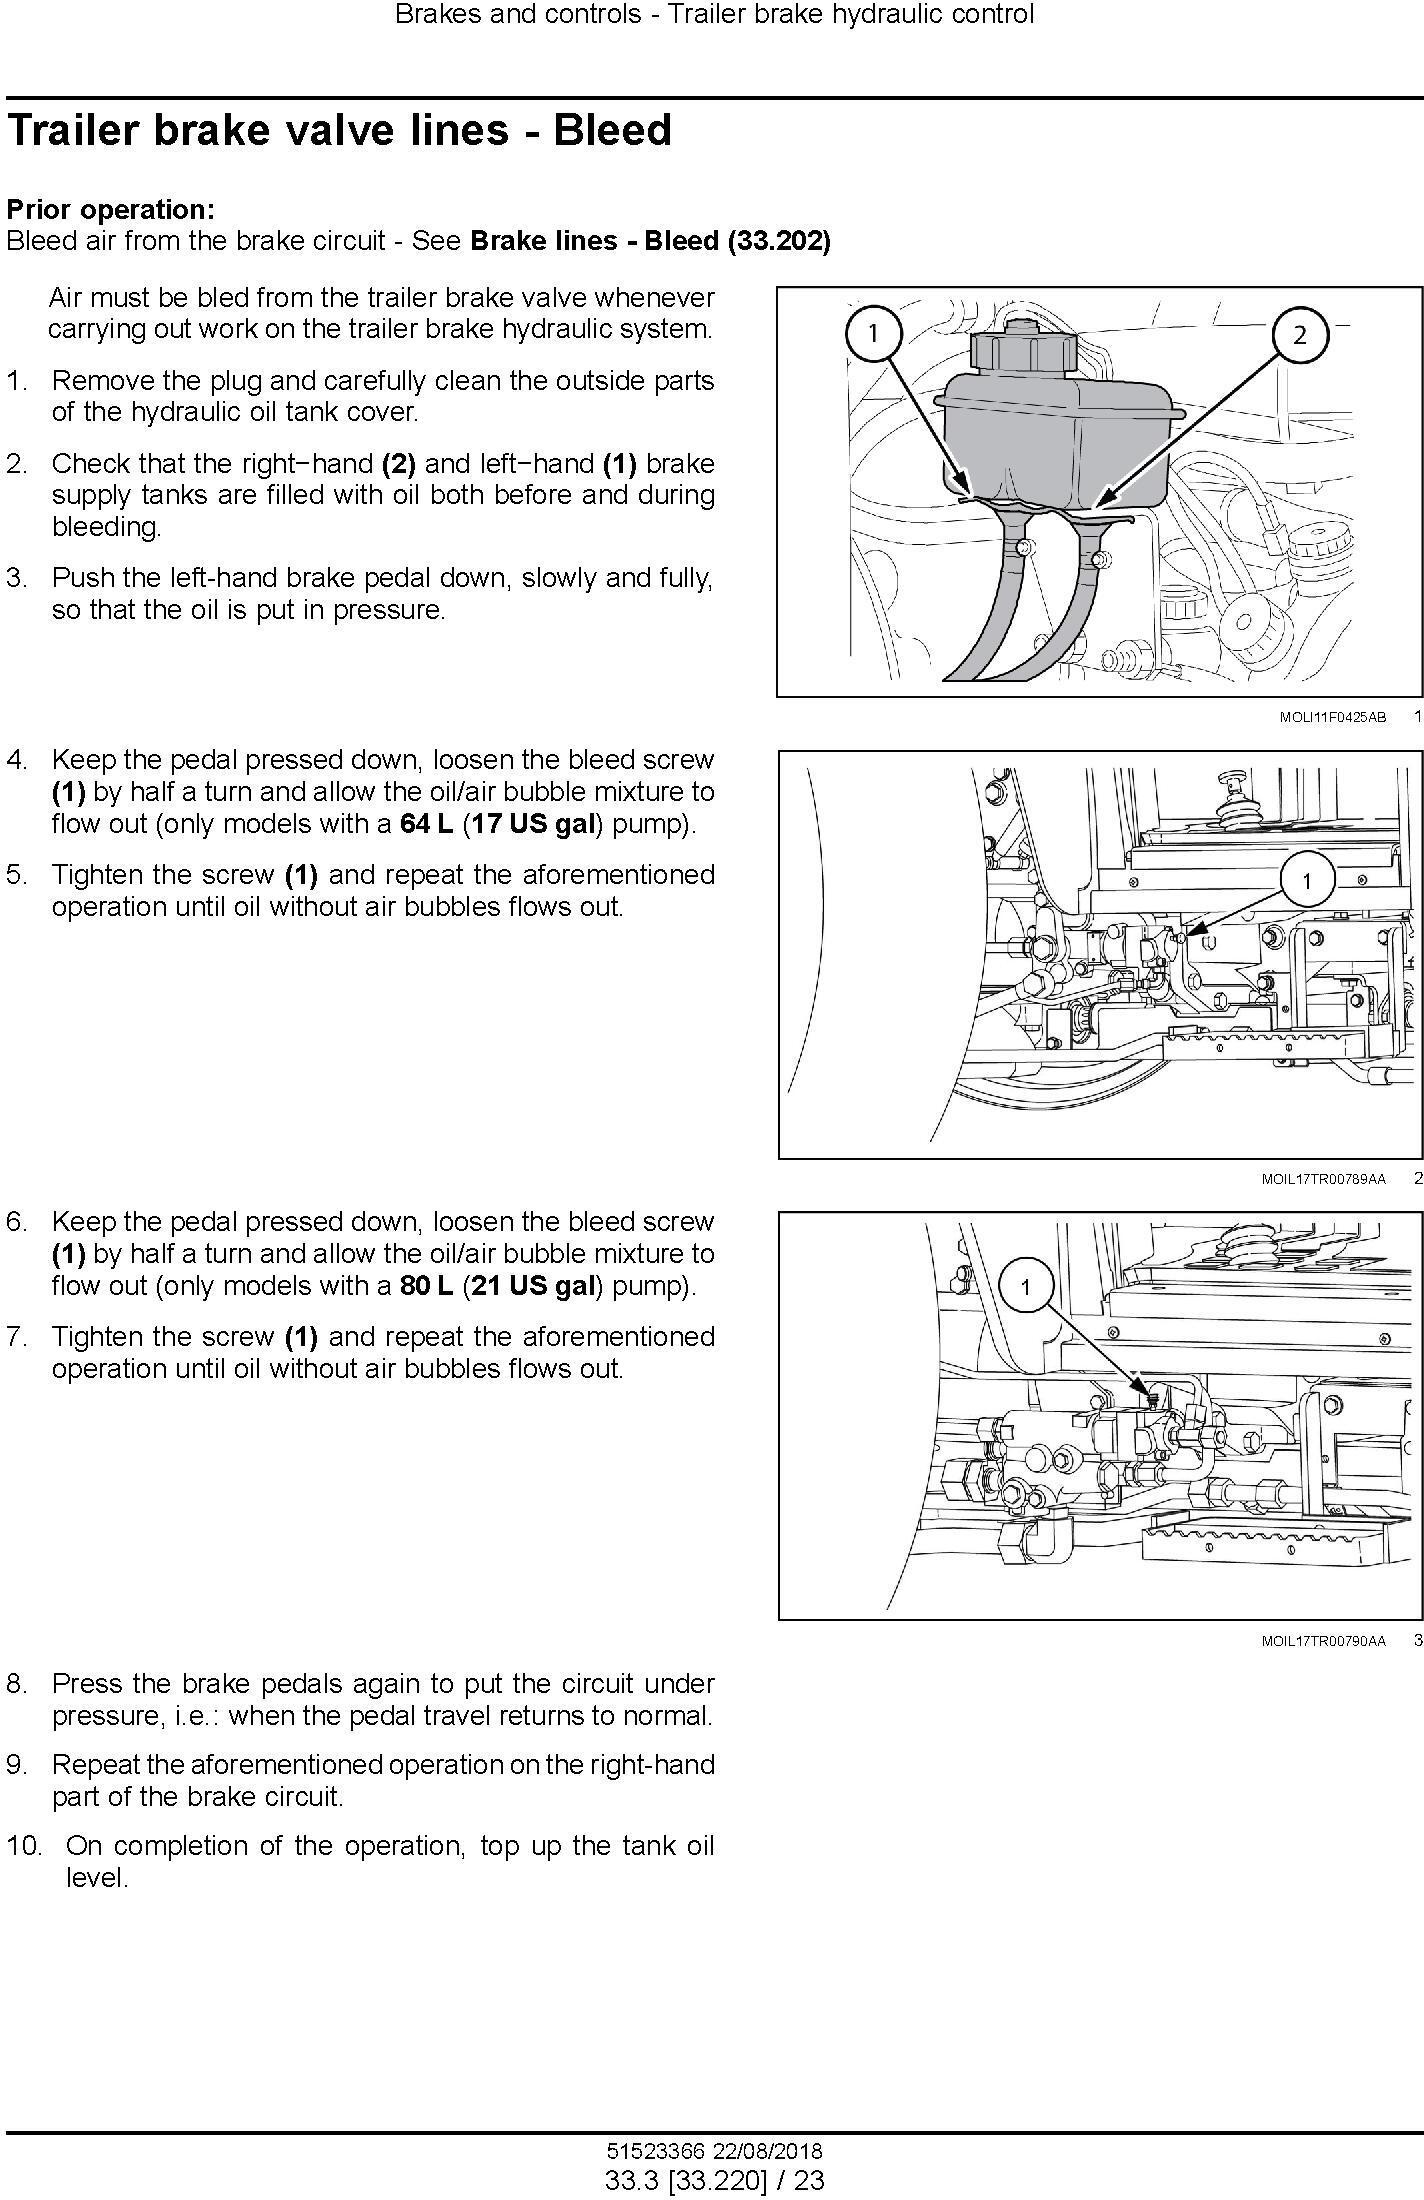 New Holland T4.80V, T4.90V, T4.100V, T4.110V, T4.80N, T4.90N, T4.100N,T4.110N Tractor Service Manual - 3